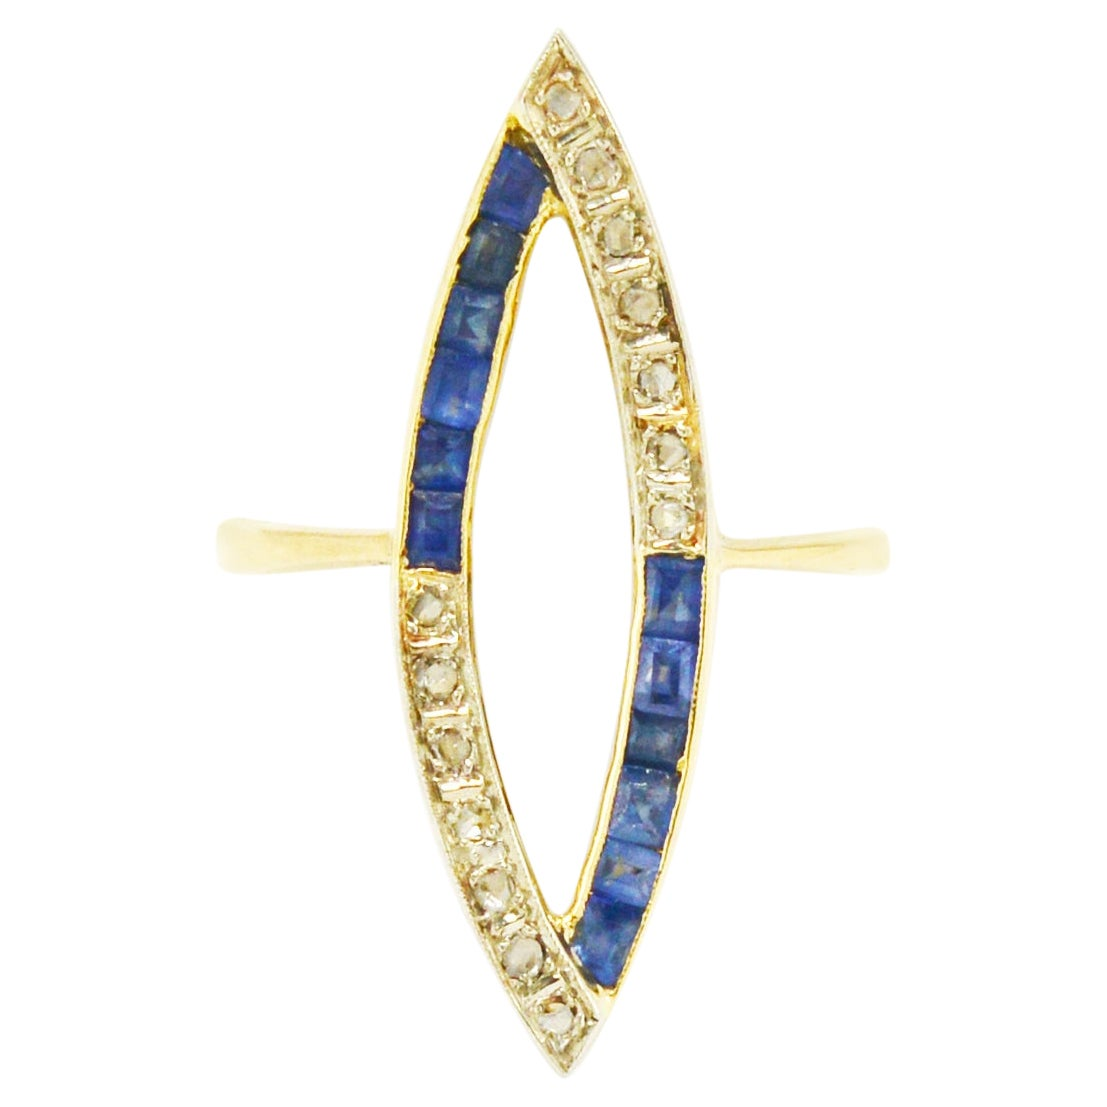 Art Deco Sapphire Diamond Cocktail Ring Long Navette 2 Tone 18k Platinum Open